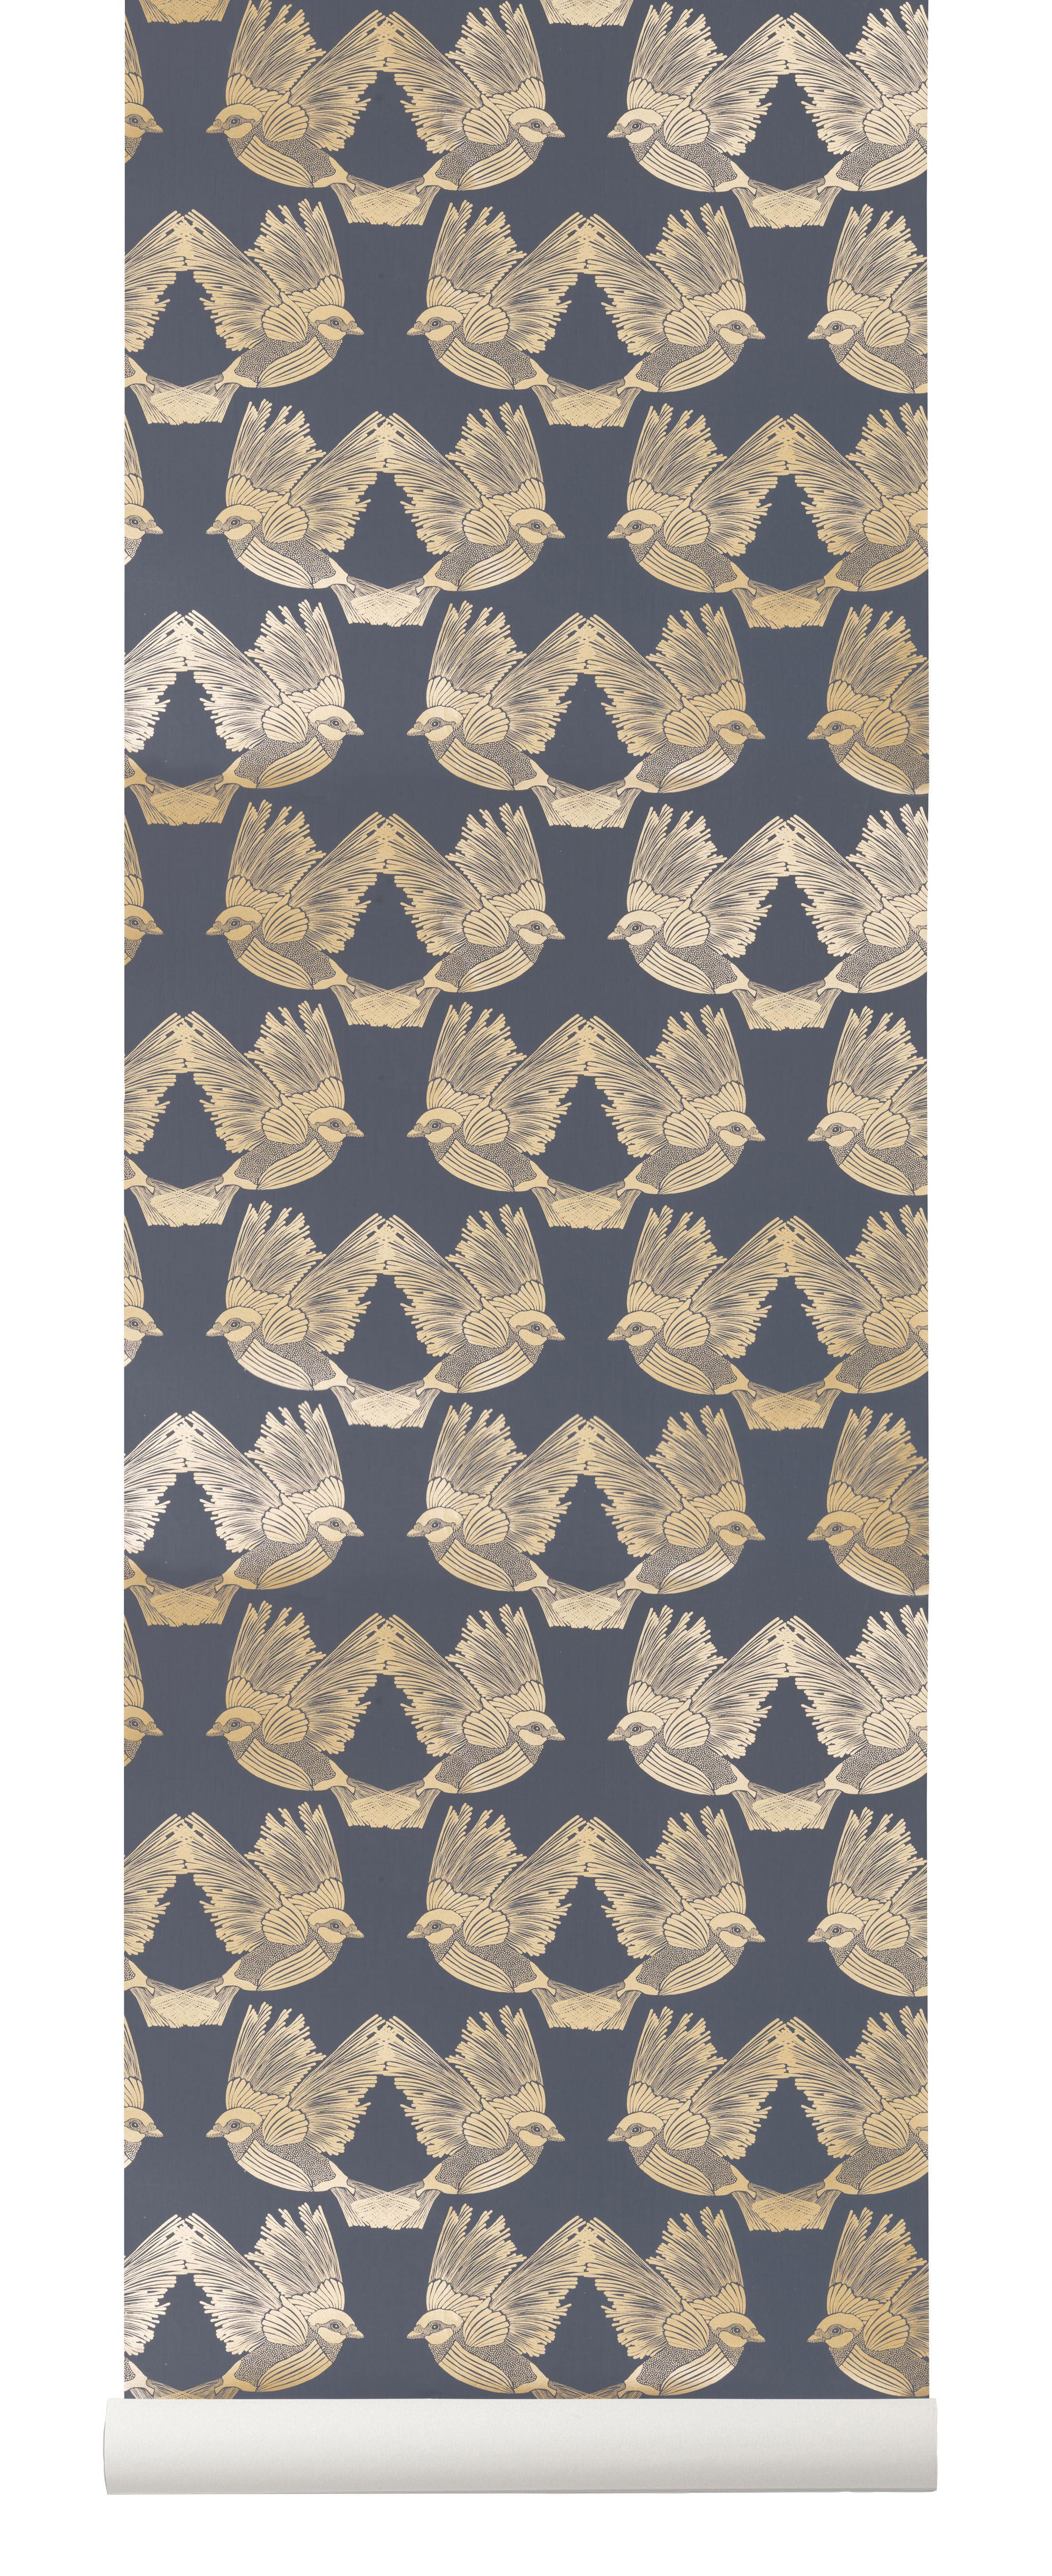 Decoration - Wallpaper & Wall Stickers - Birds Wallpaper - / 1 roll - Width 53 cm by Ferm Living - Dark blue & gold - Non-woven fabric